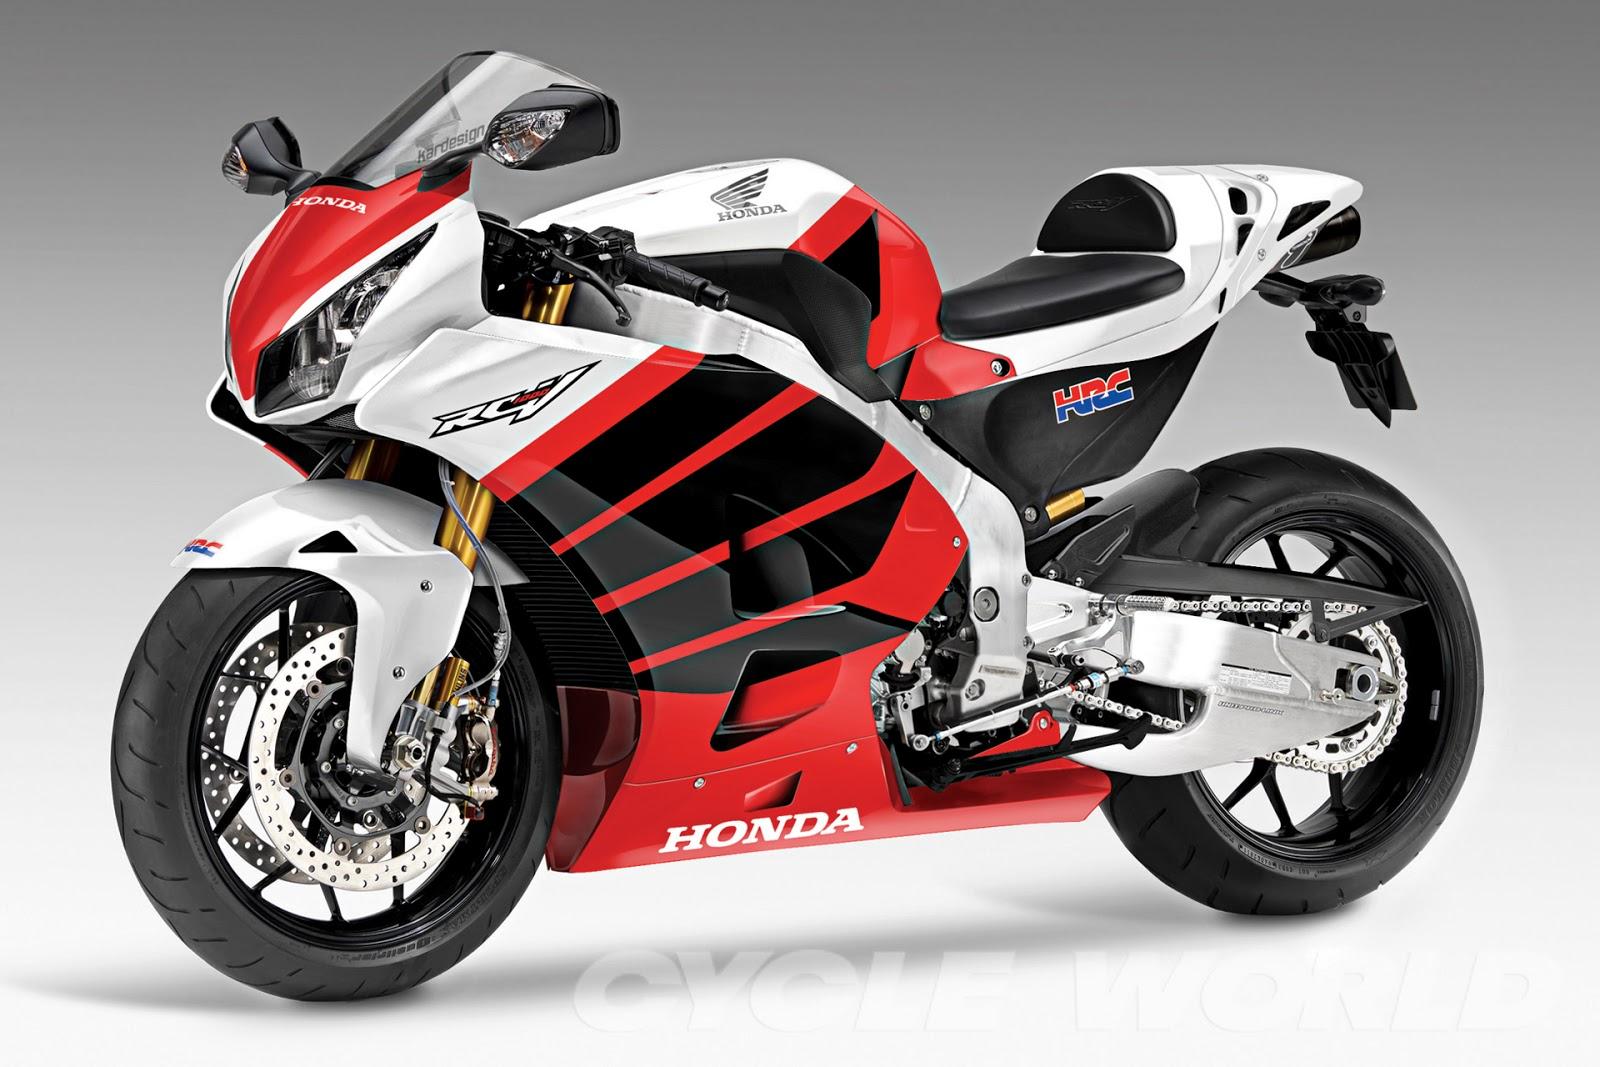 honda bikes all models honda bikes all models honda bikes all models